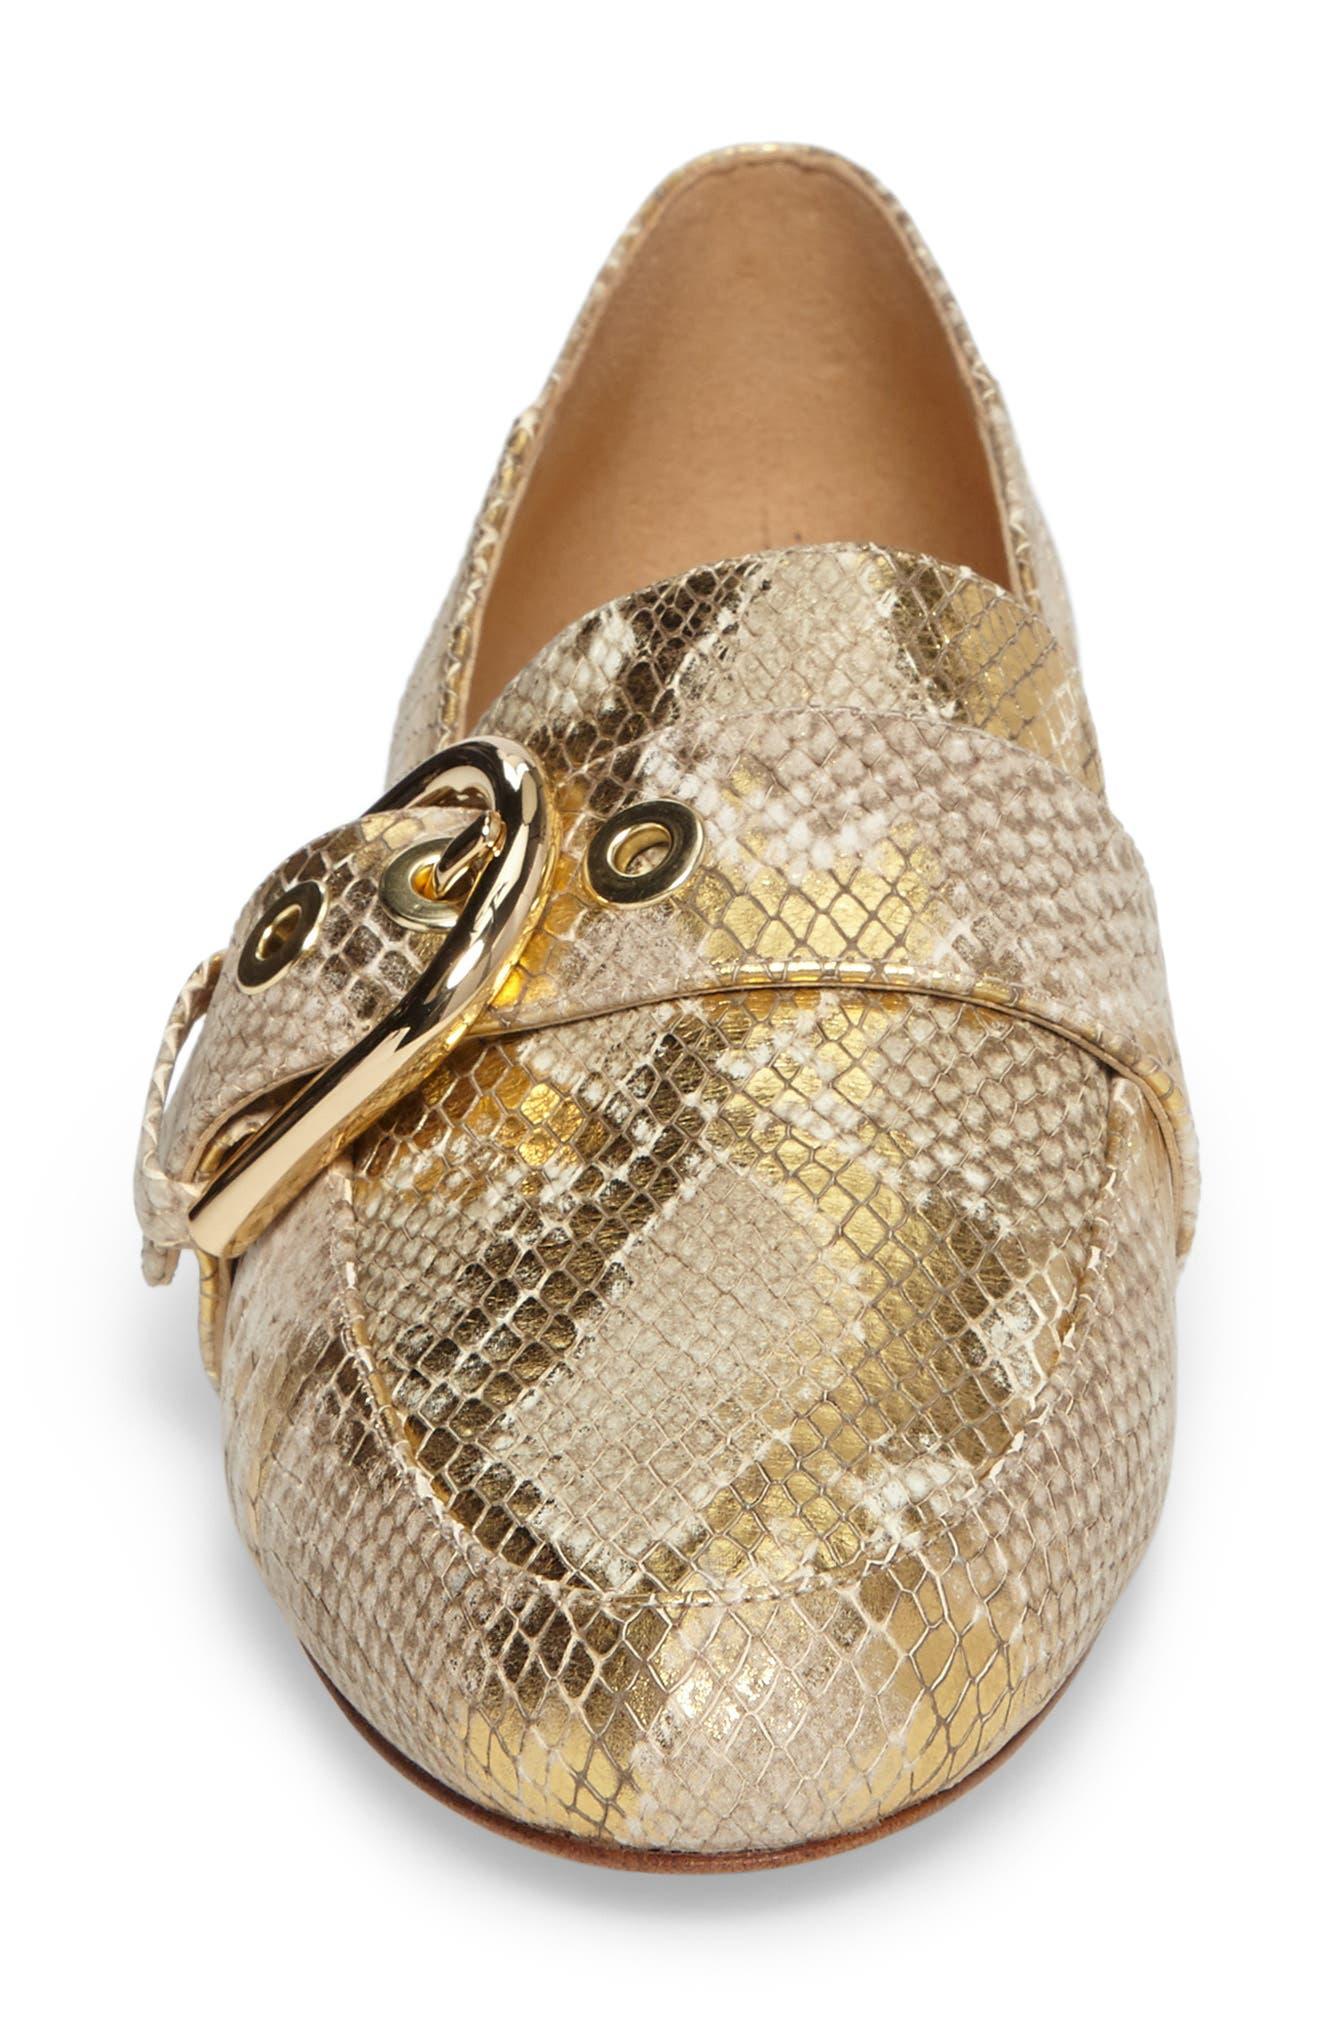 Cooper Loafer,                             Alternate thumbnail 4, color,                             Natural/ Gold Snakeskin